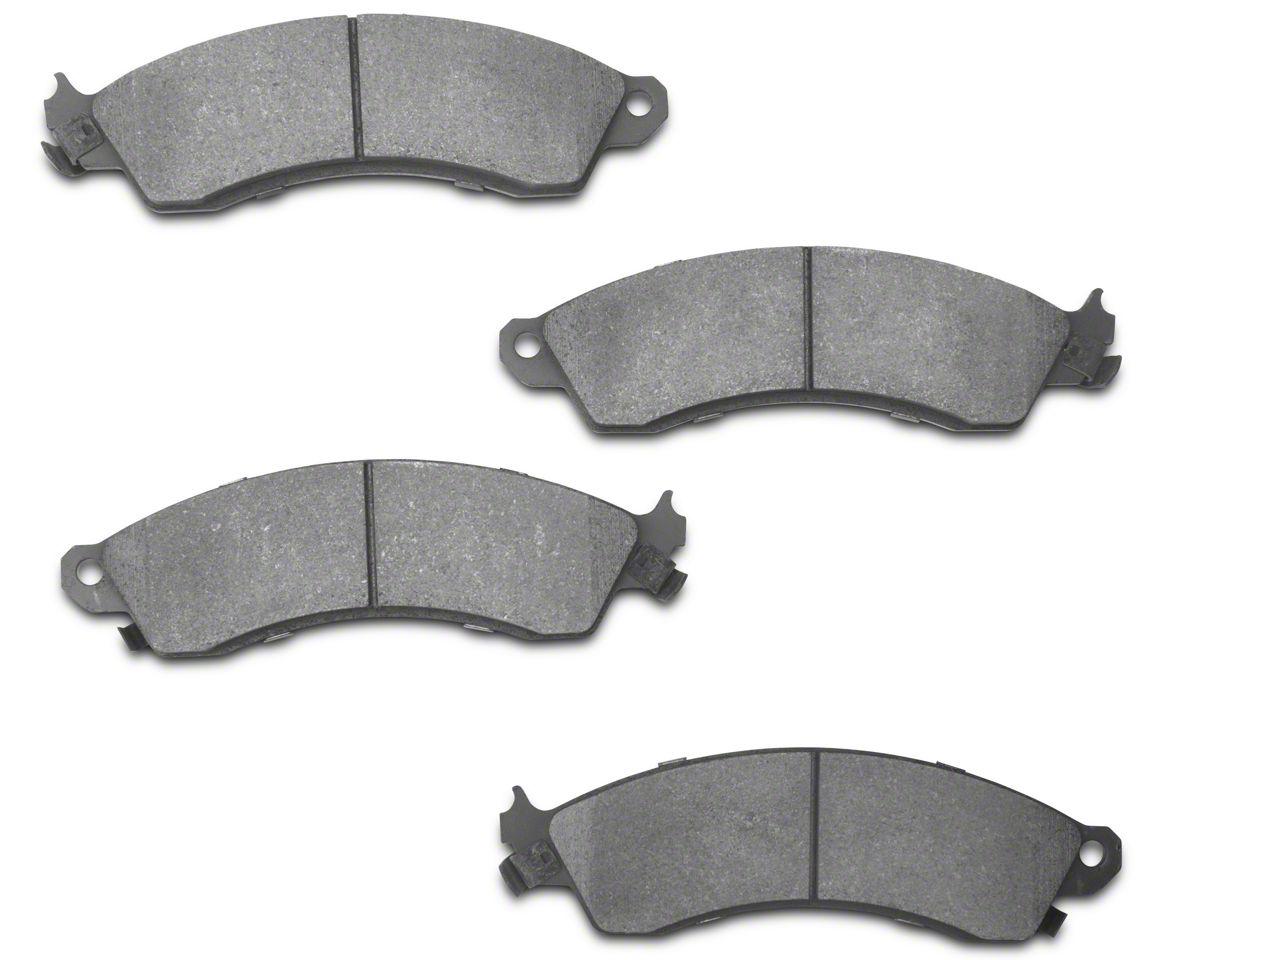 StopTech Street Performance Low-Dust Composite Brake Pads - Front Pair (94-04 Cobra, Bullitt, Mach 1)